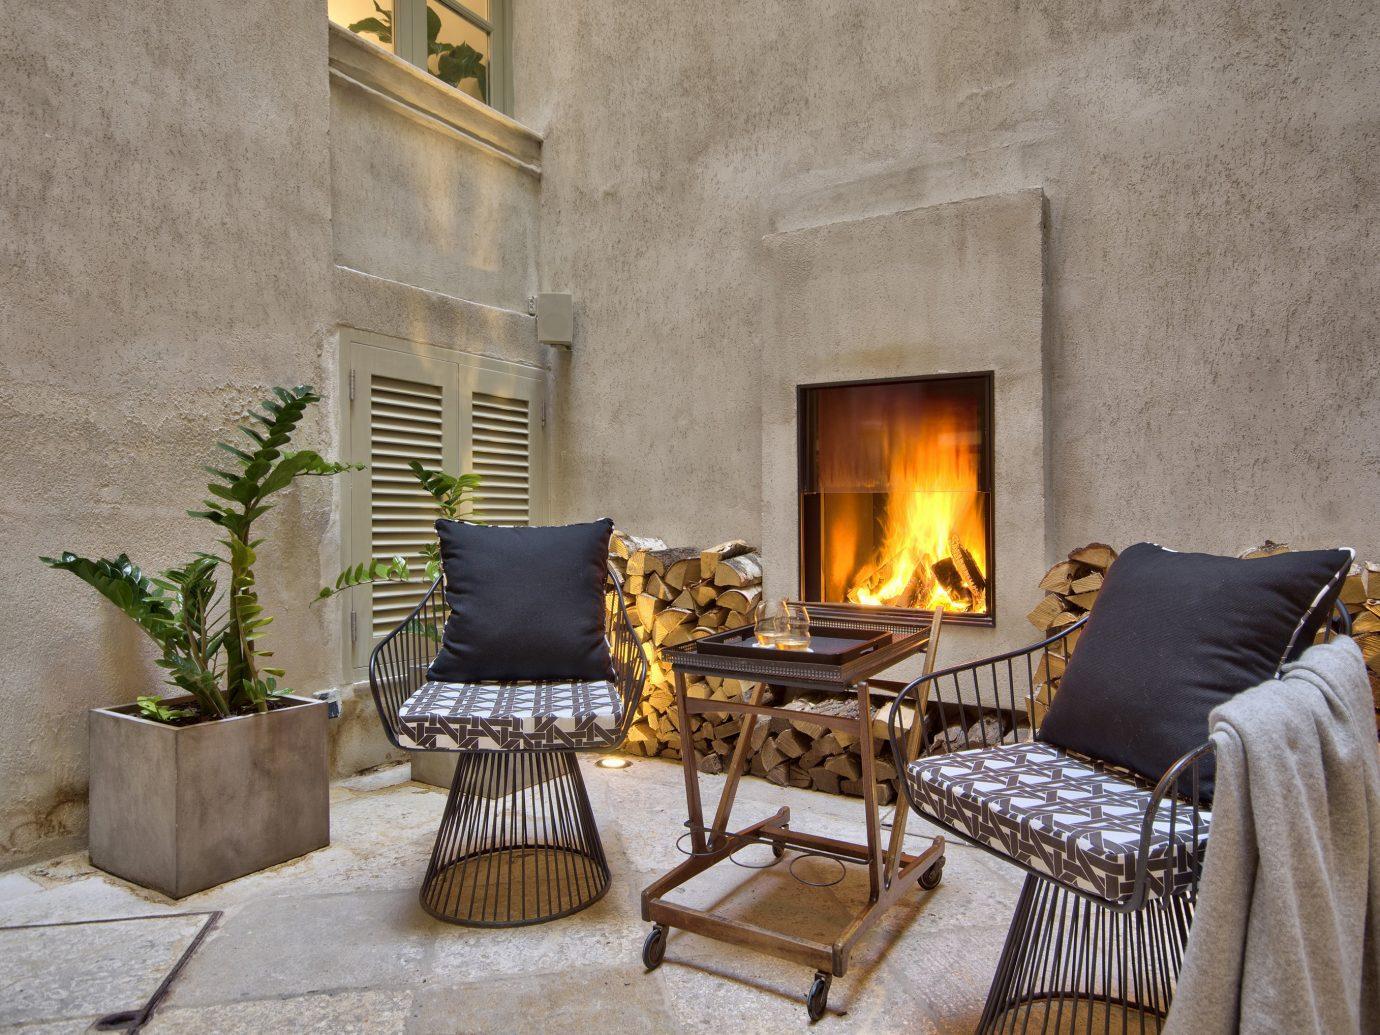 Hotels Living room property hearth house living room home Fireplace estate floor wood cottage interior design stone Villa backyard farmhouse furniture area